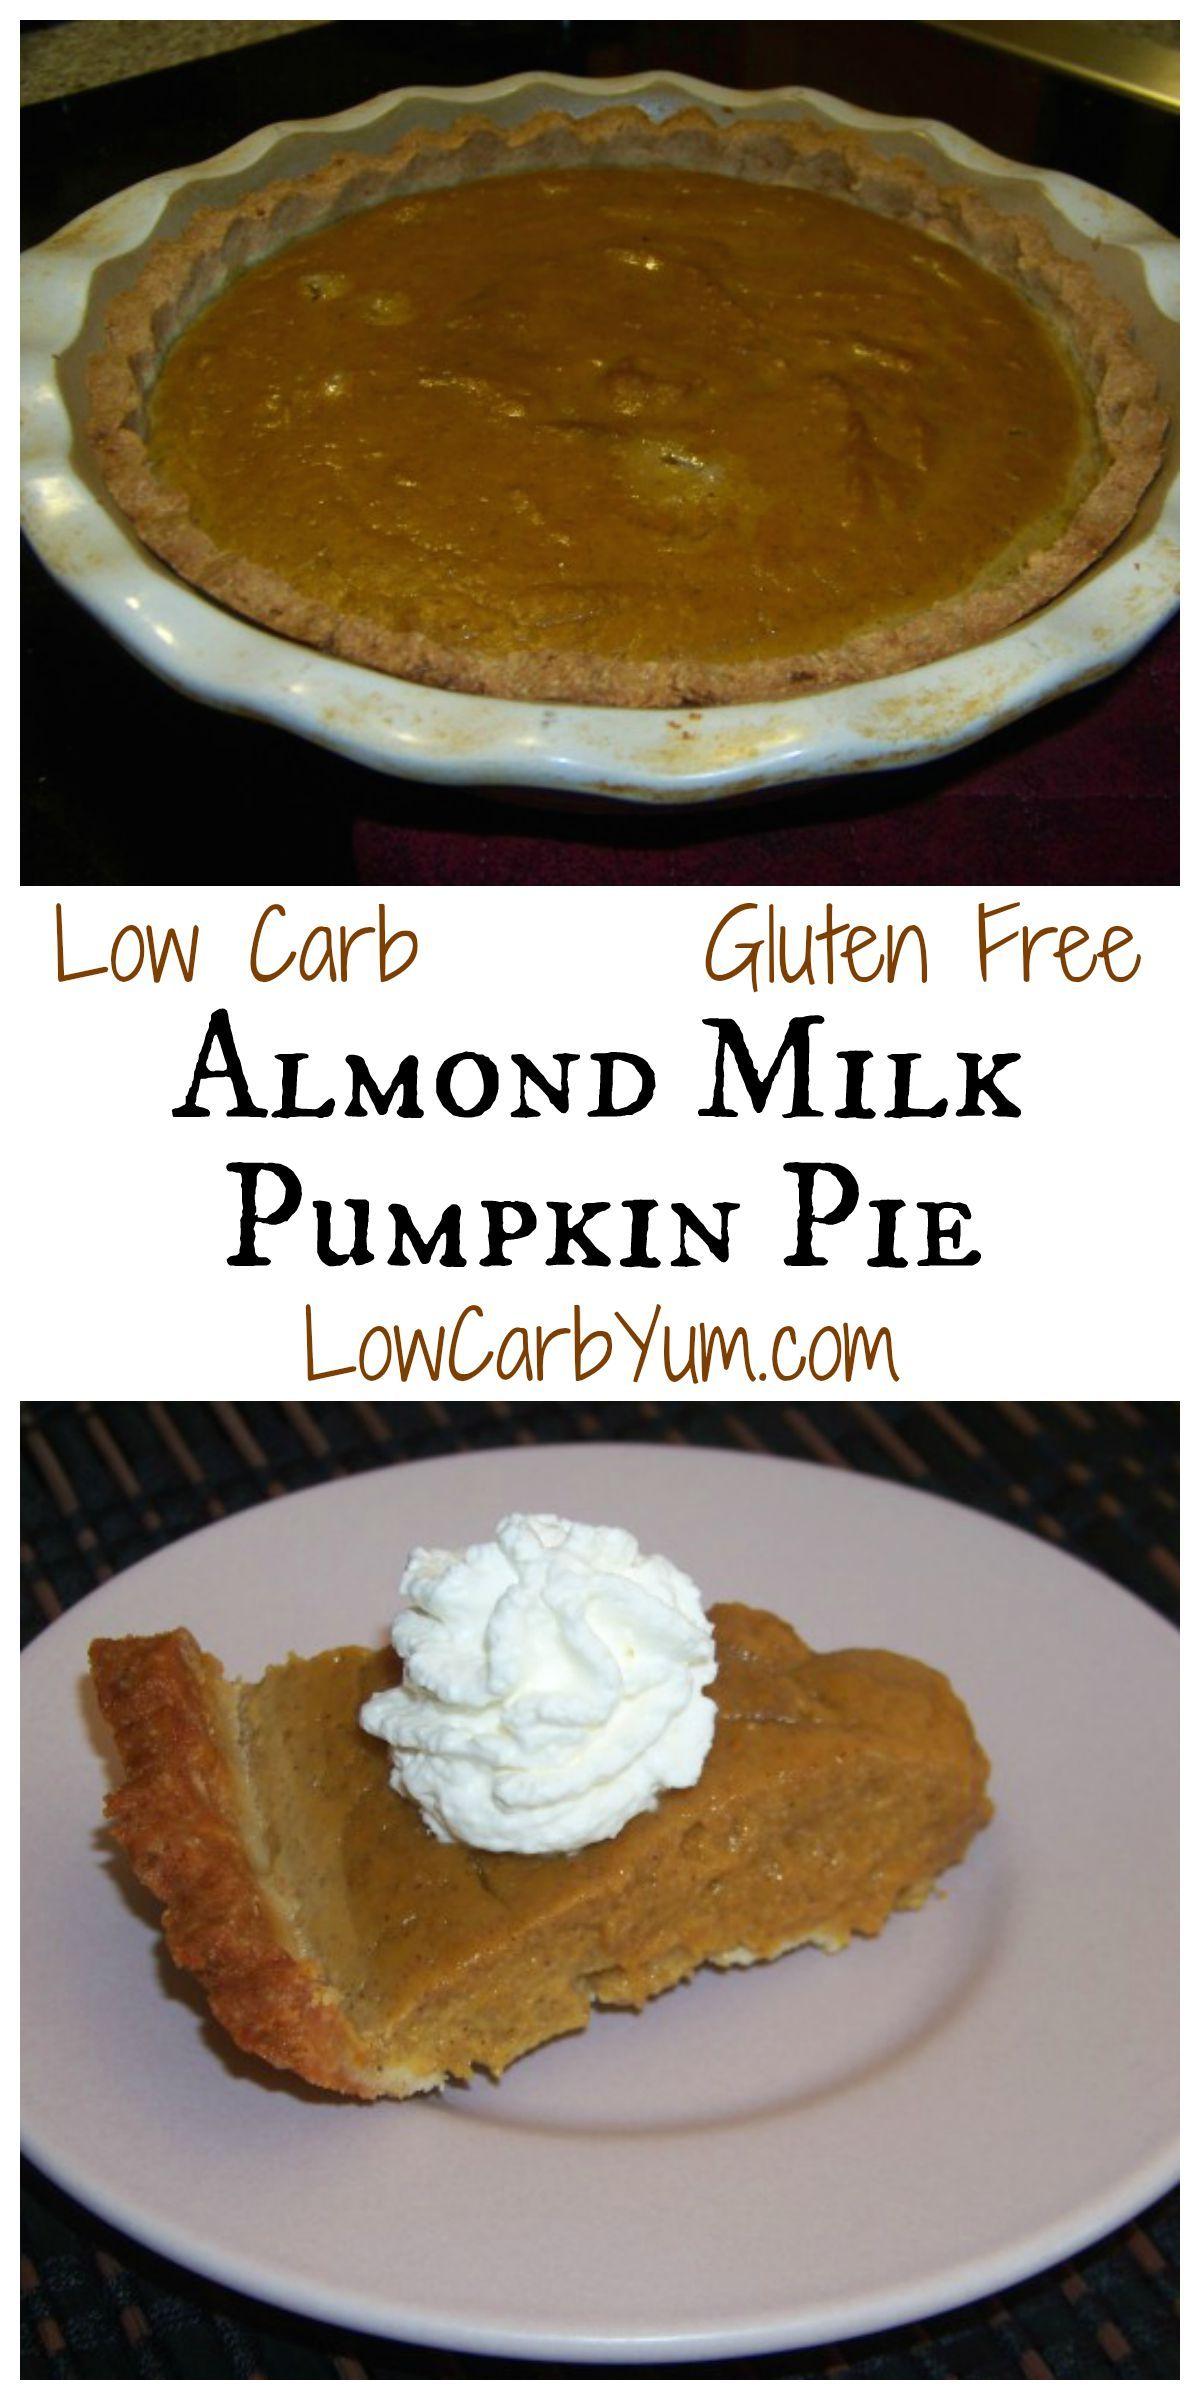 A Low Carb And Gluten Free Almond Milk Pumpkin Pie Recipe That